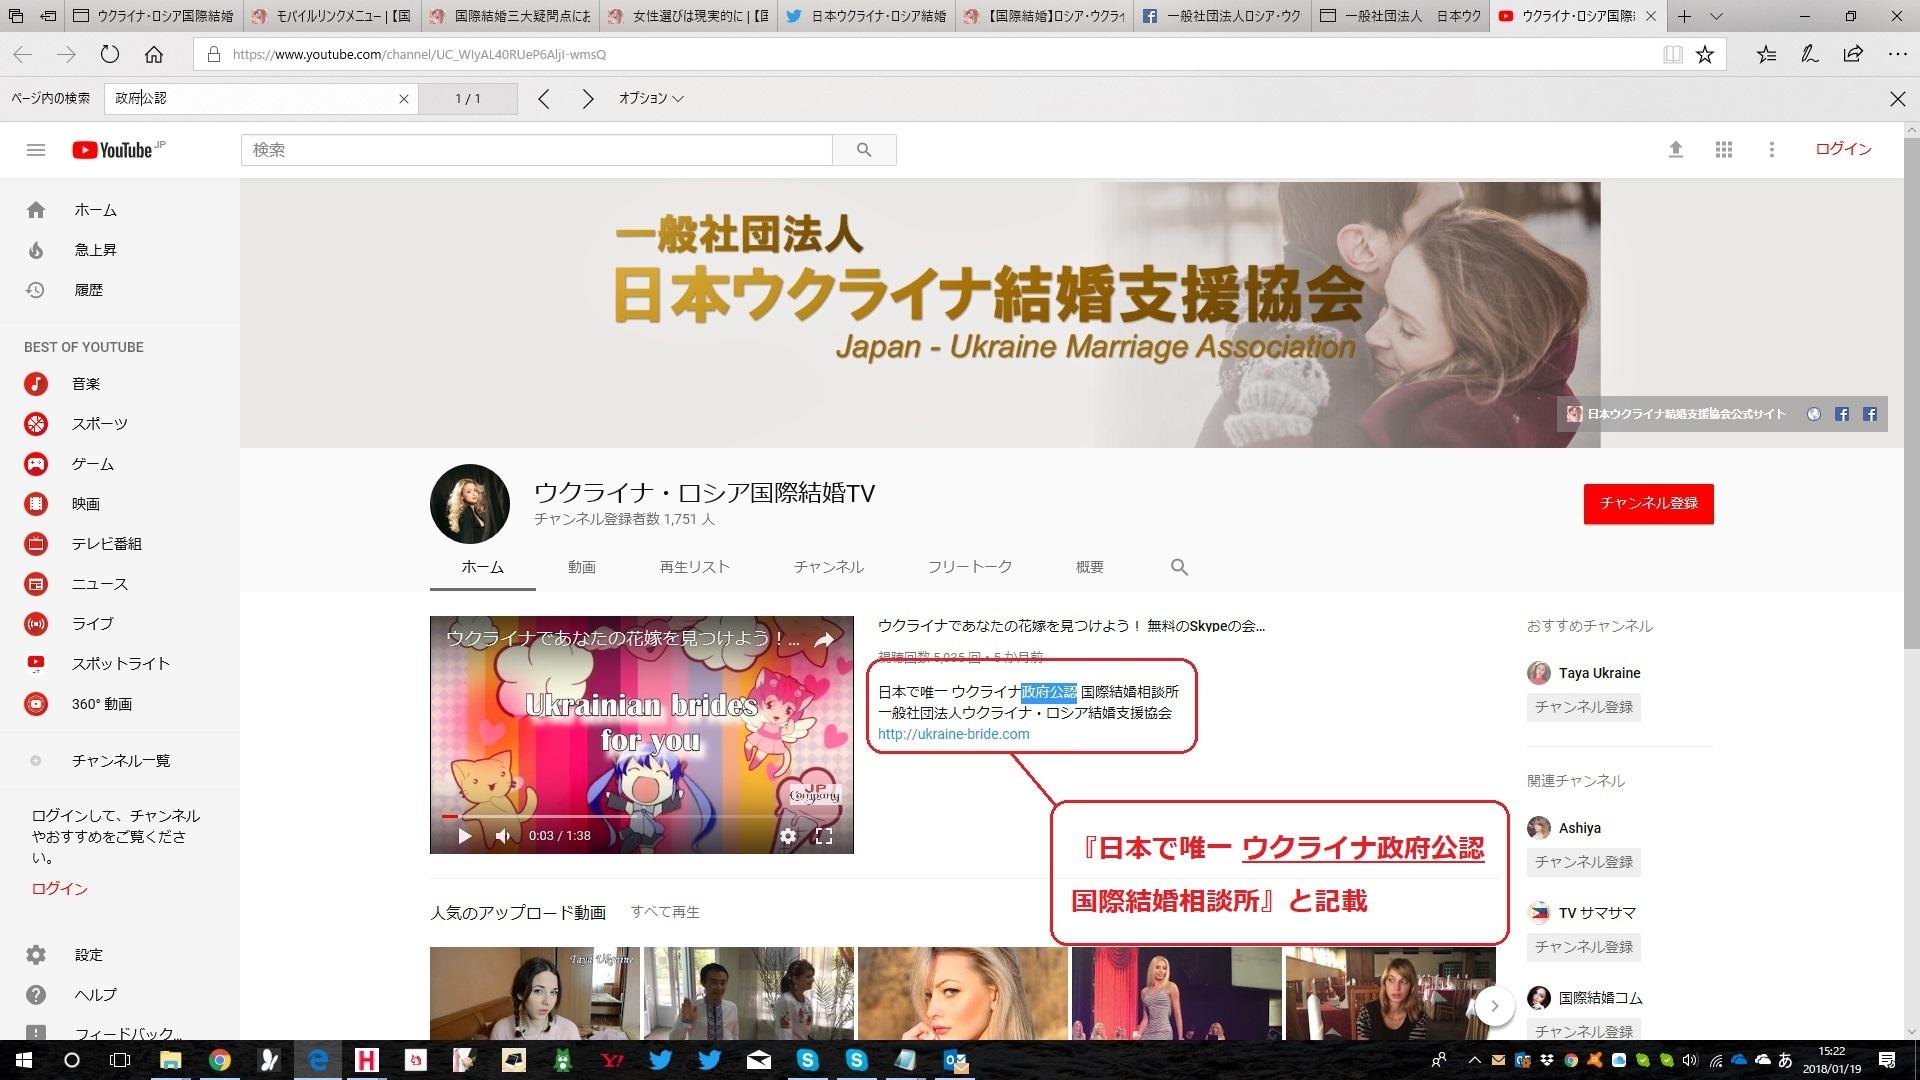 youtube_kakudai.jpg